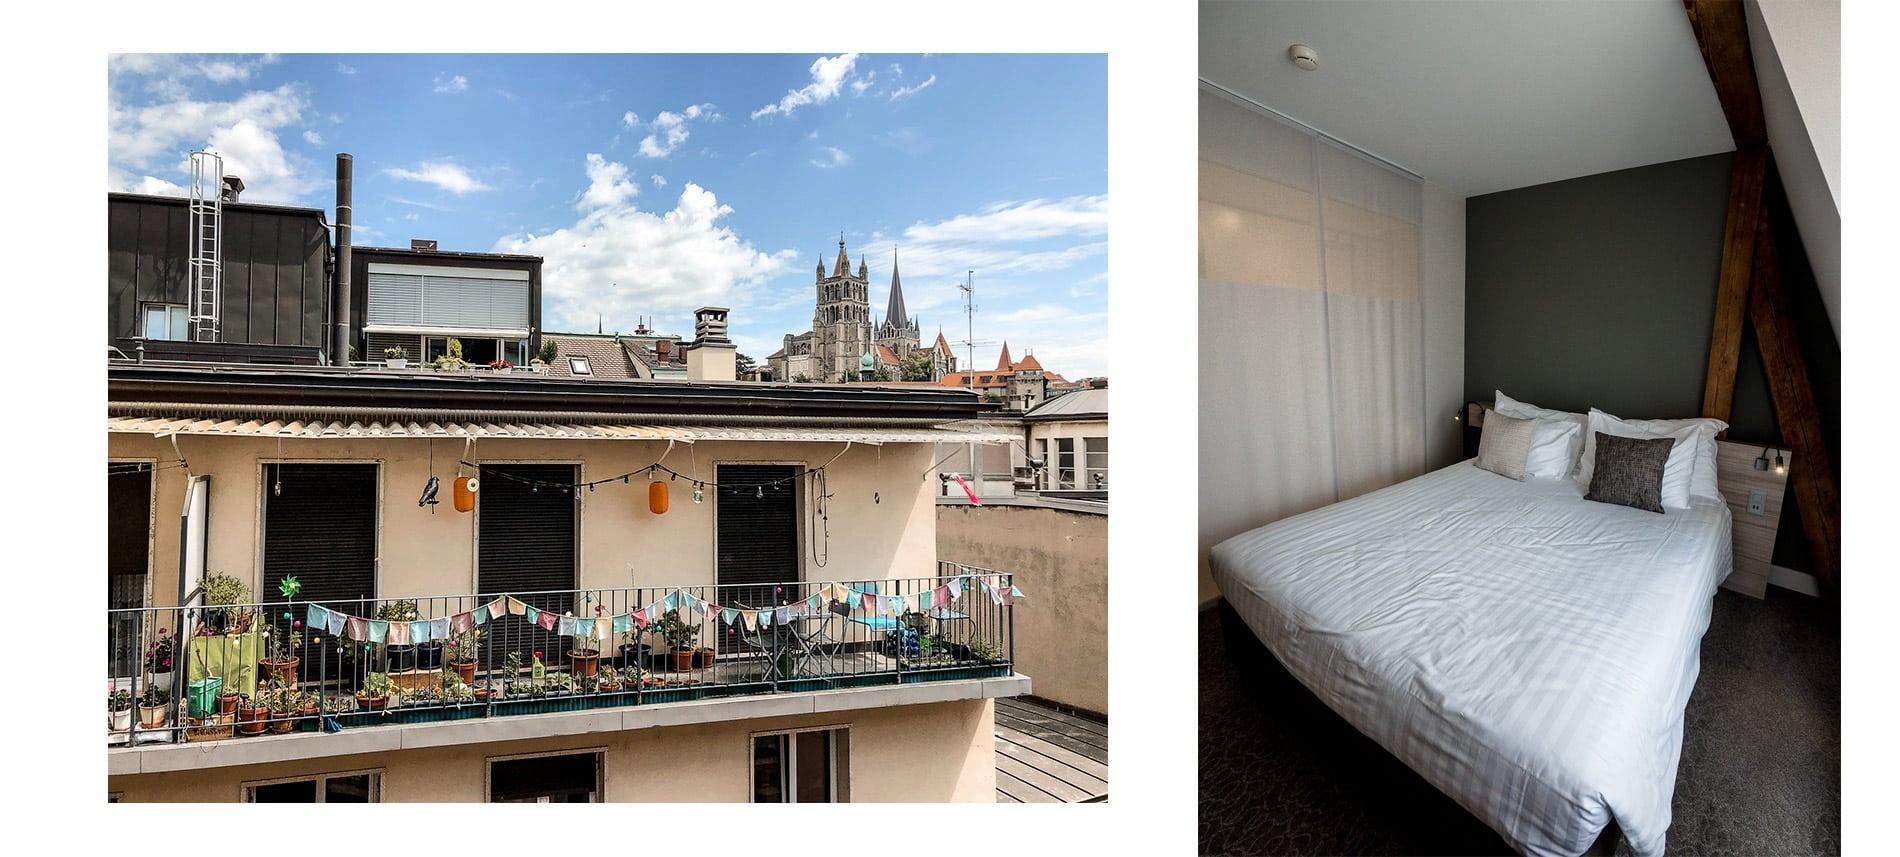 Suisse | Lausanne |hebergement | Mademoiselle-voyage | conseils